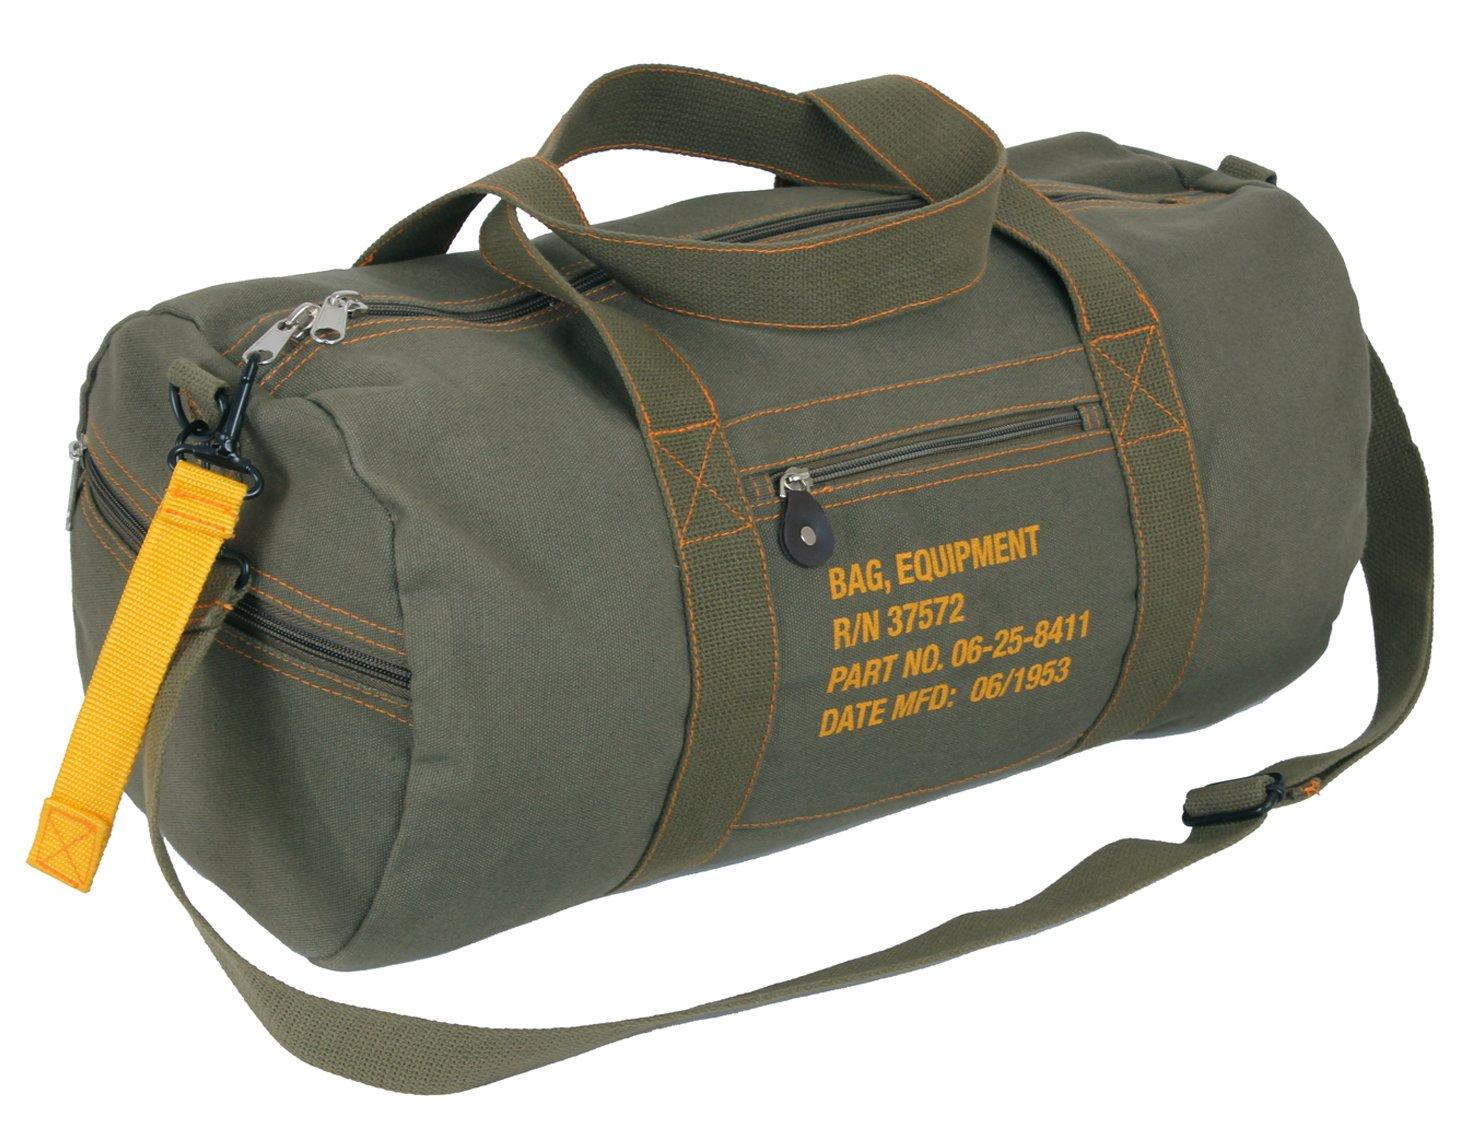 Rothco Canvas Equipment Bag, Olive Drab